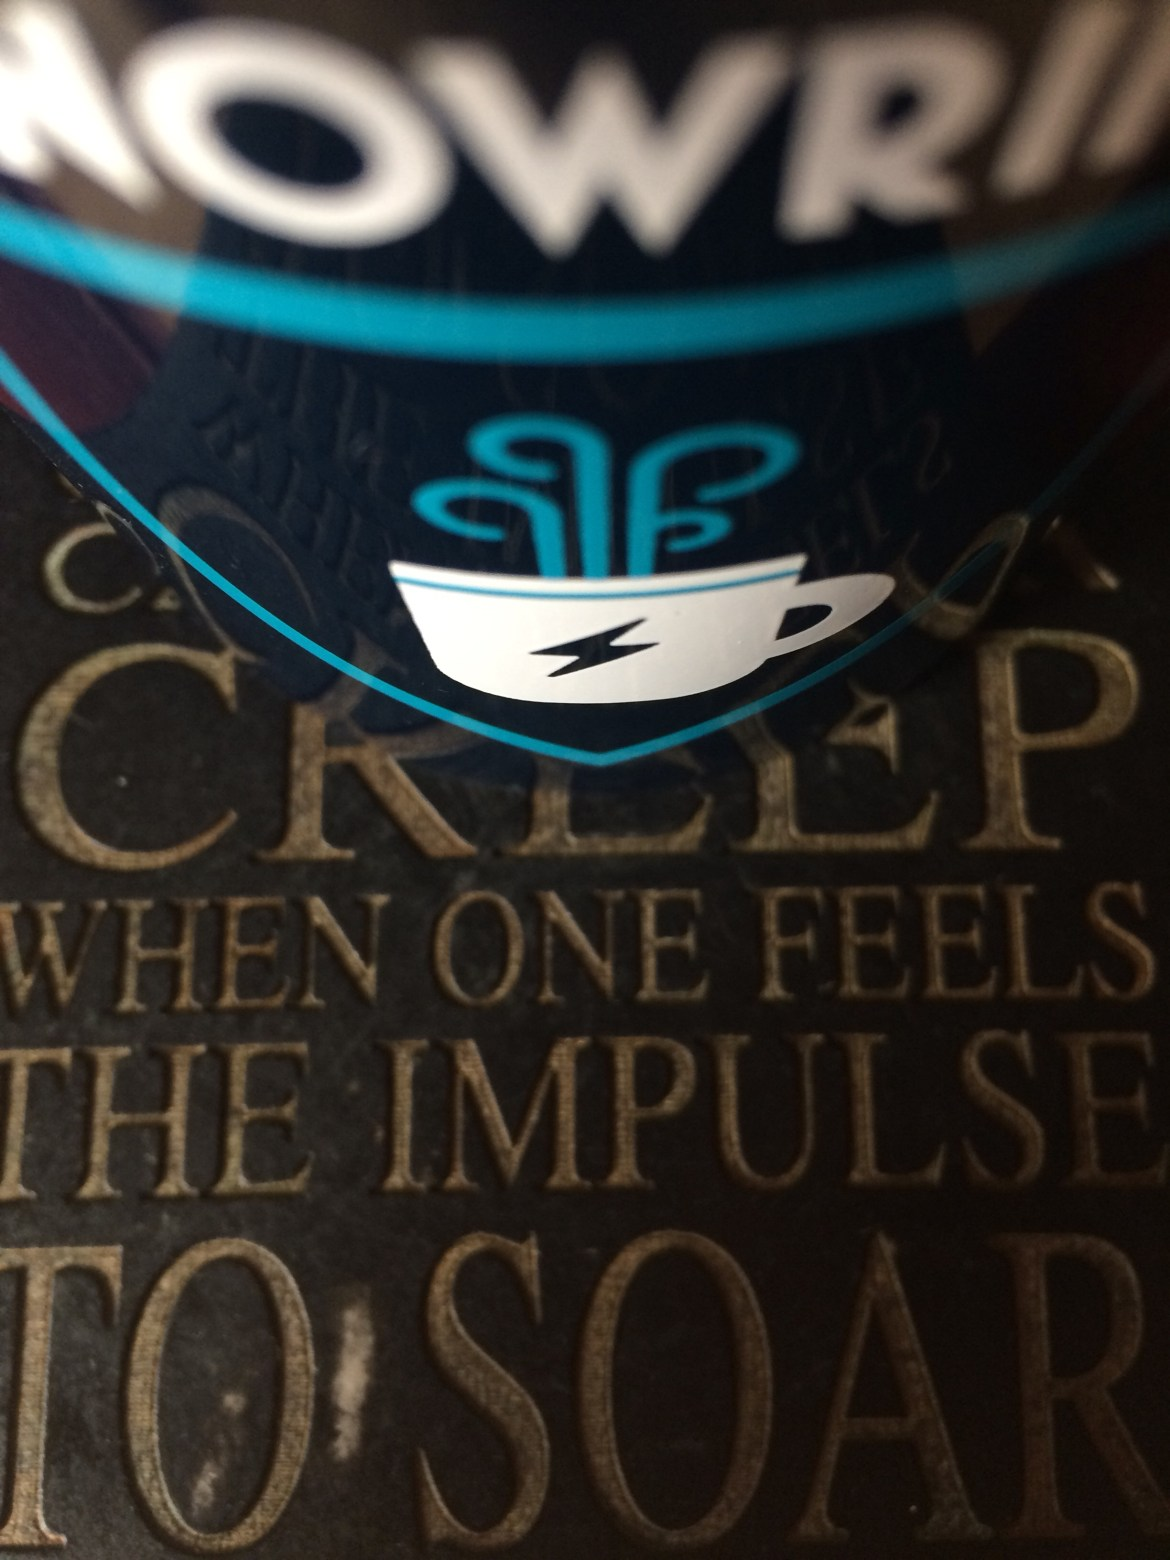 Why creep when feel impulse to soar